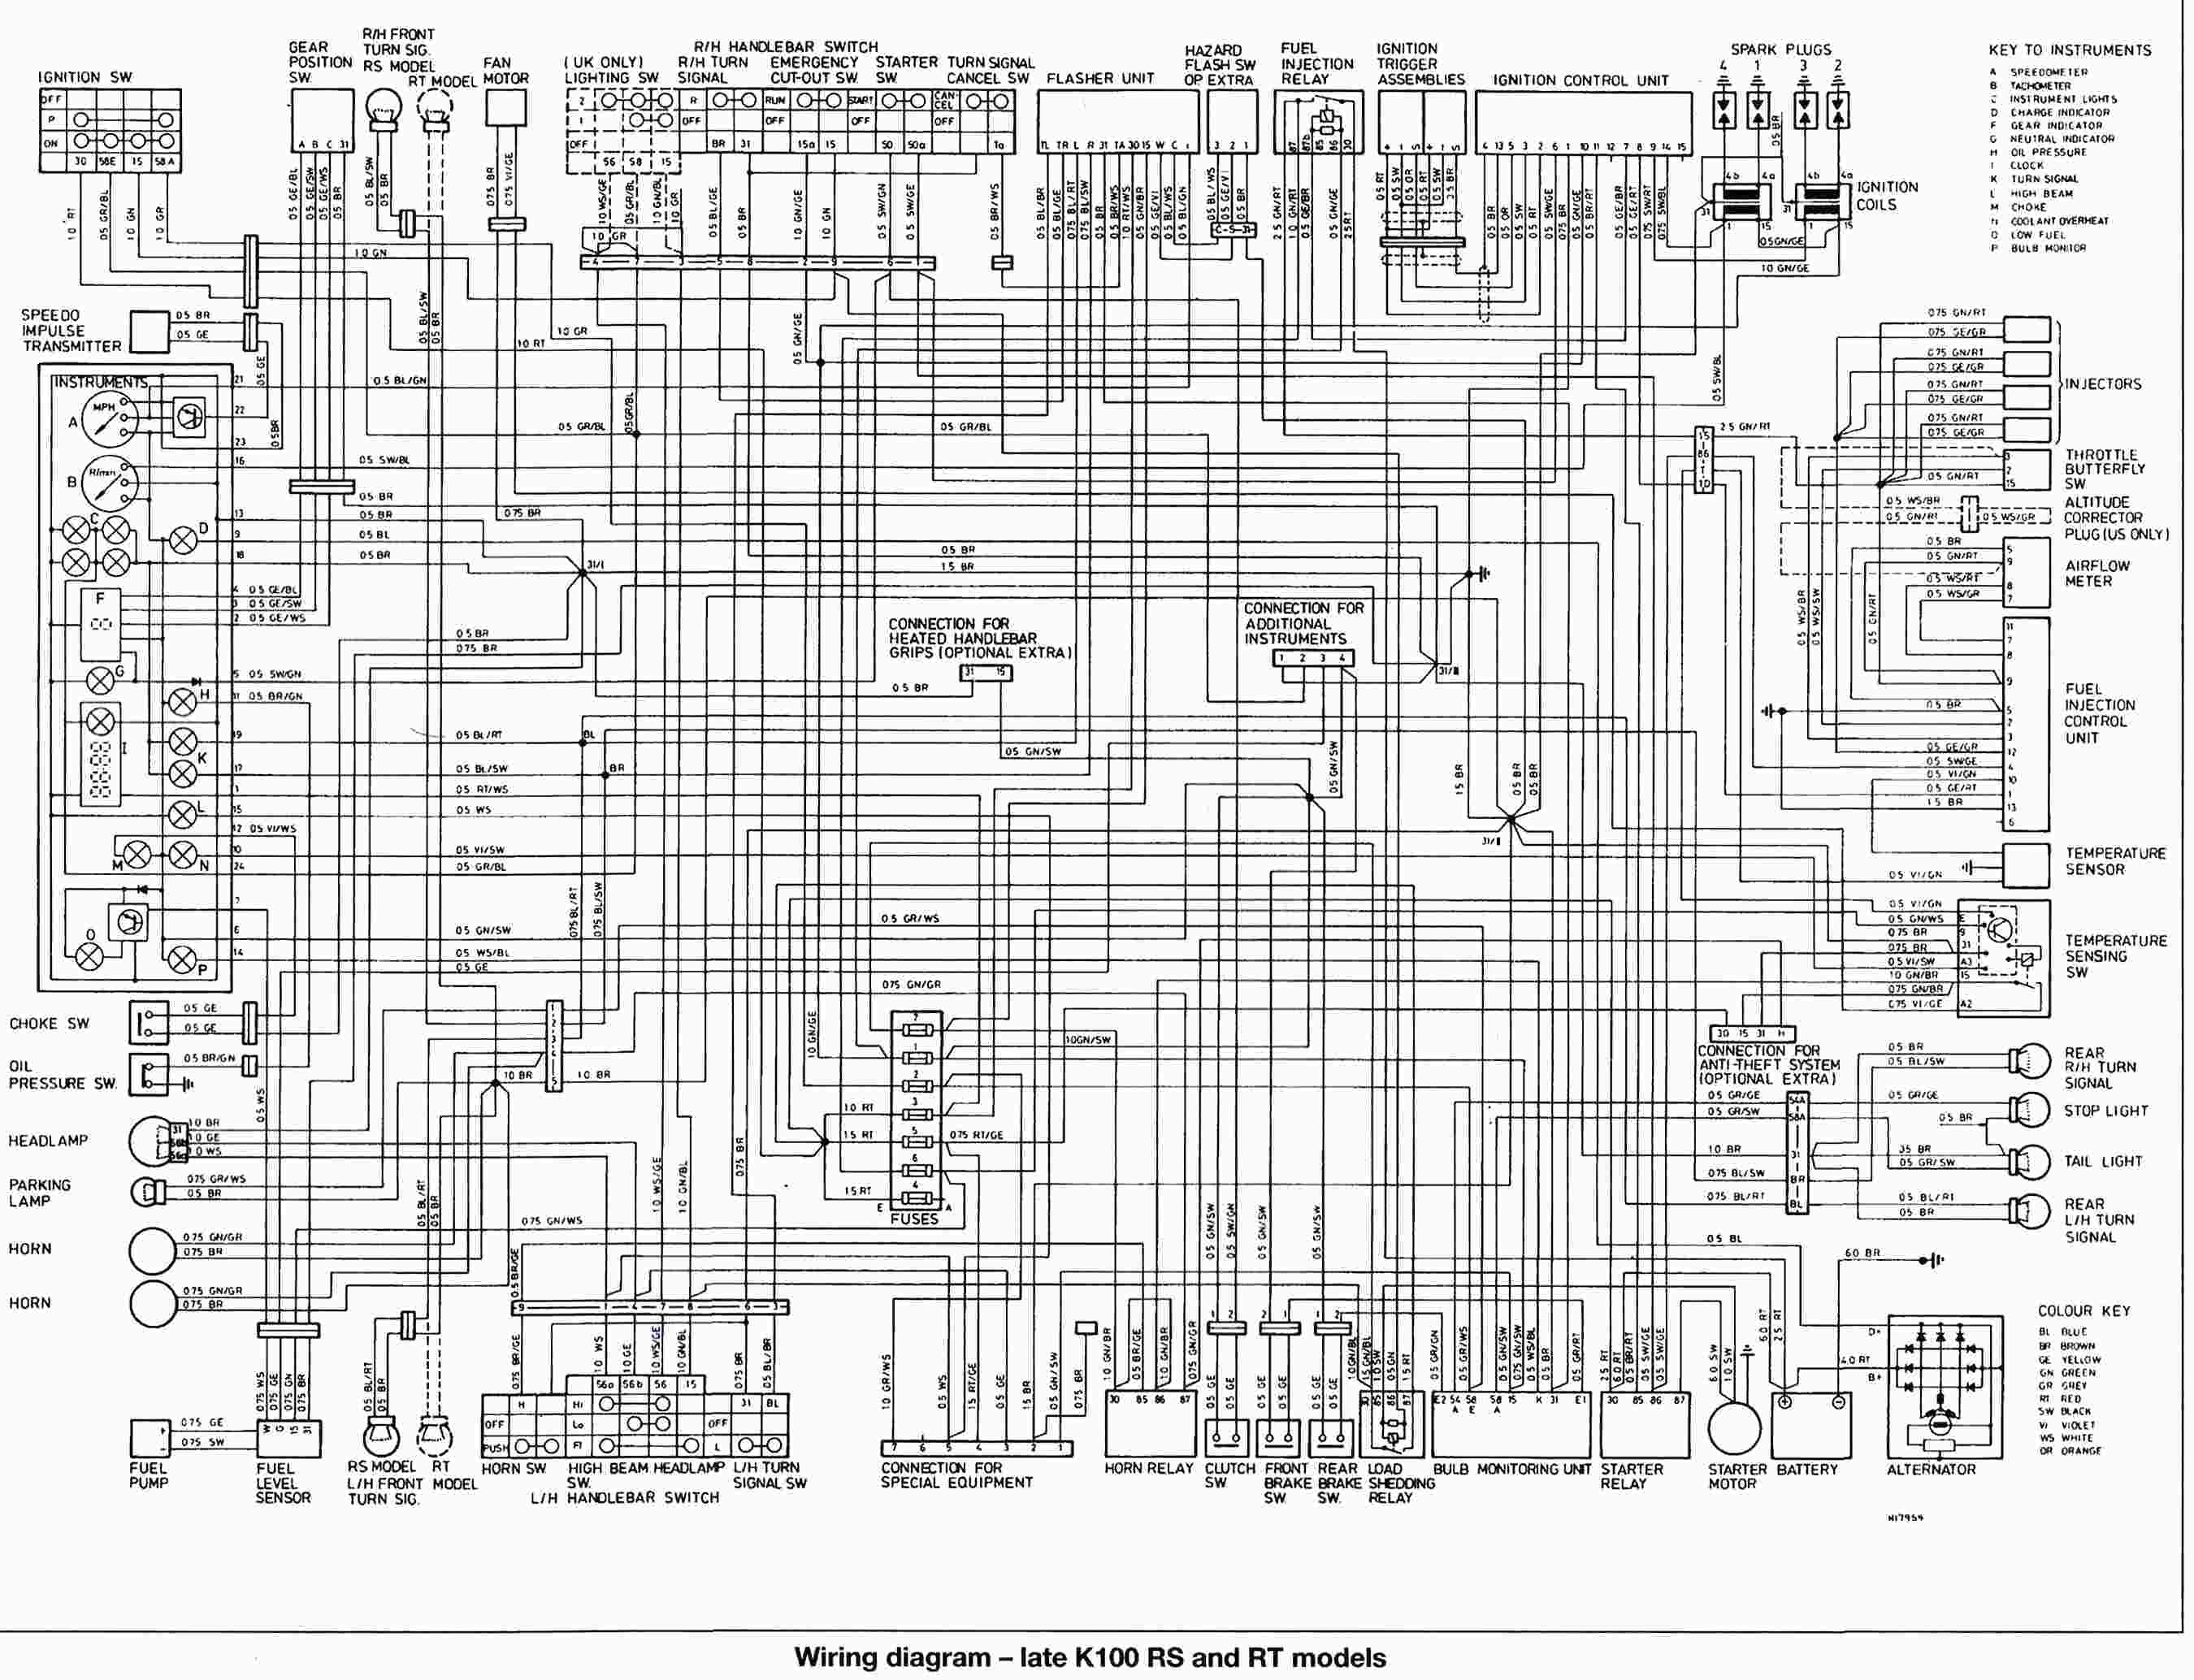 Bmw N52 Wiring Diagram | Wiring Diagram - Bmw Wiring Diagram